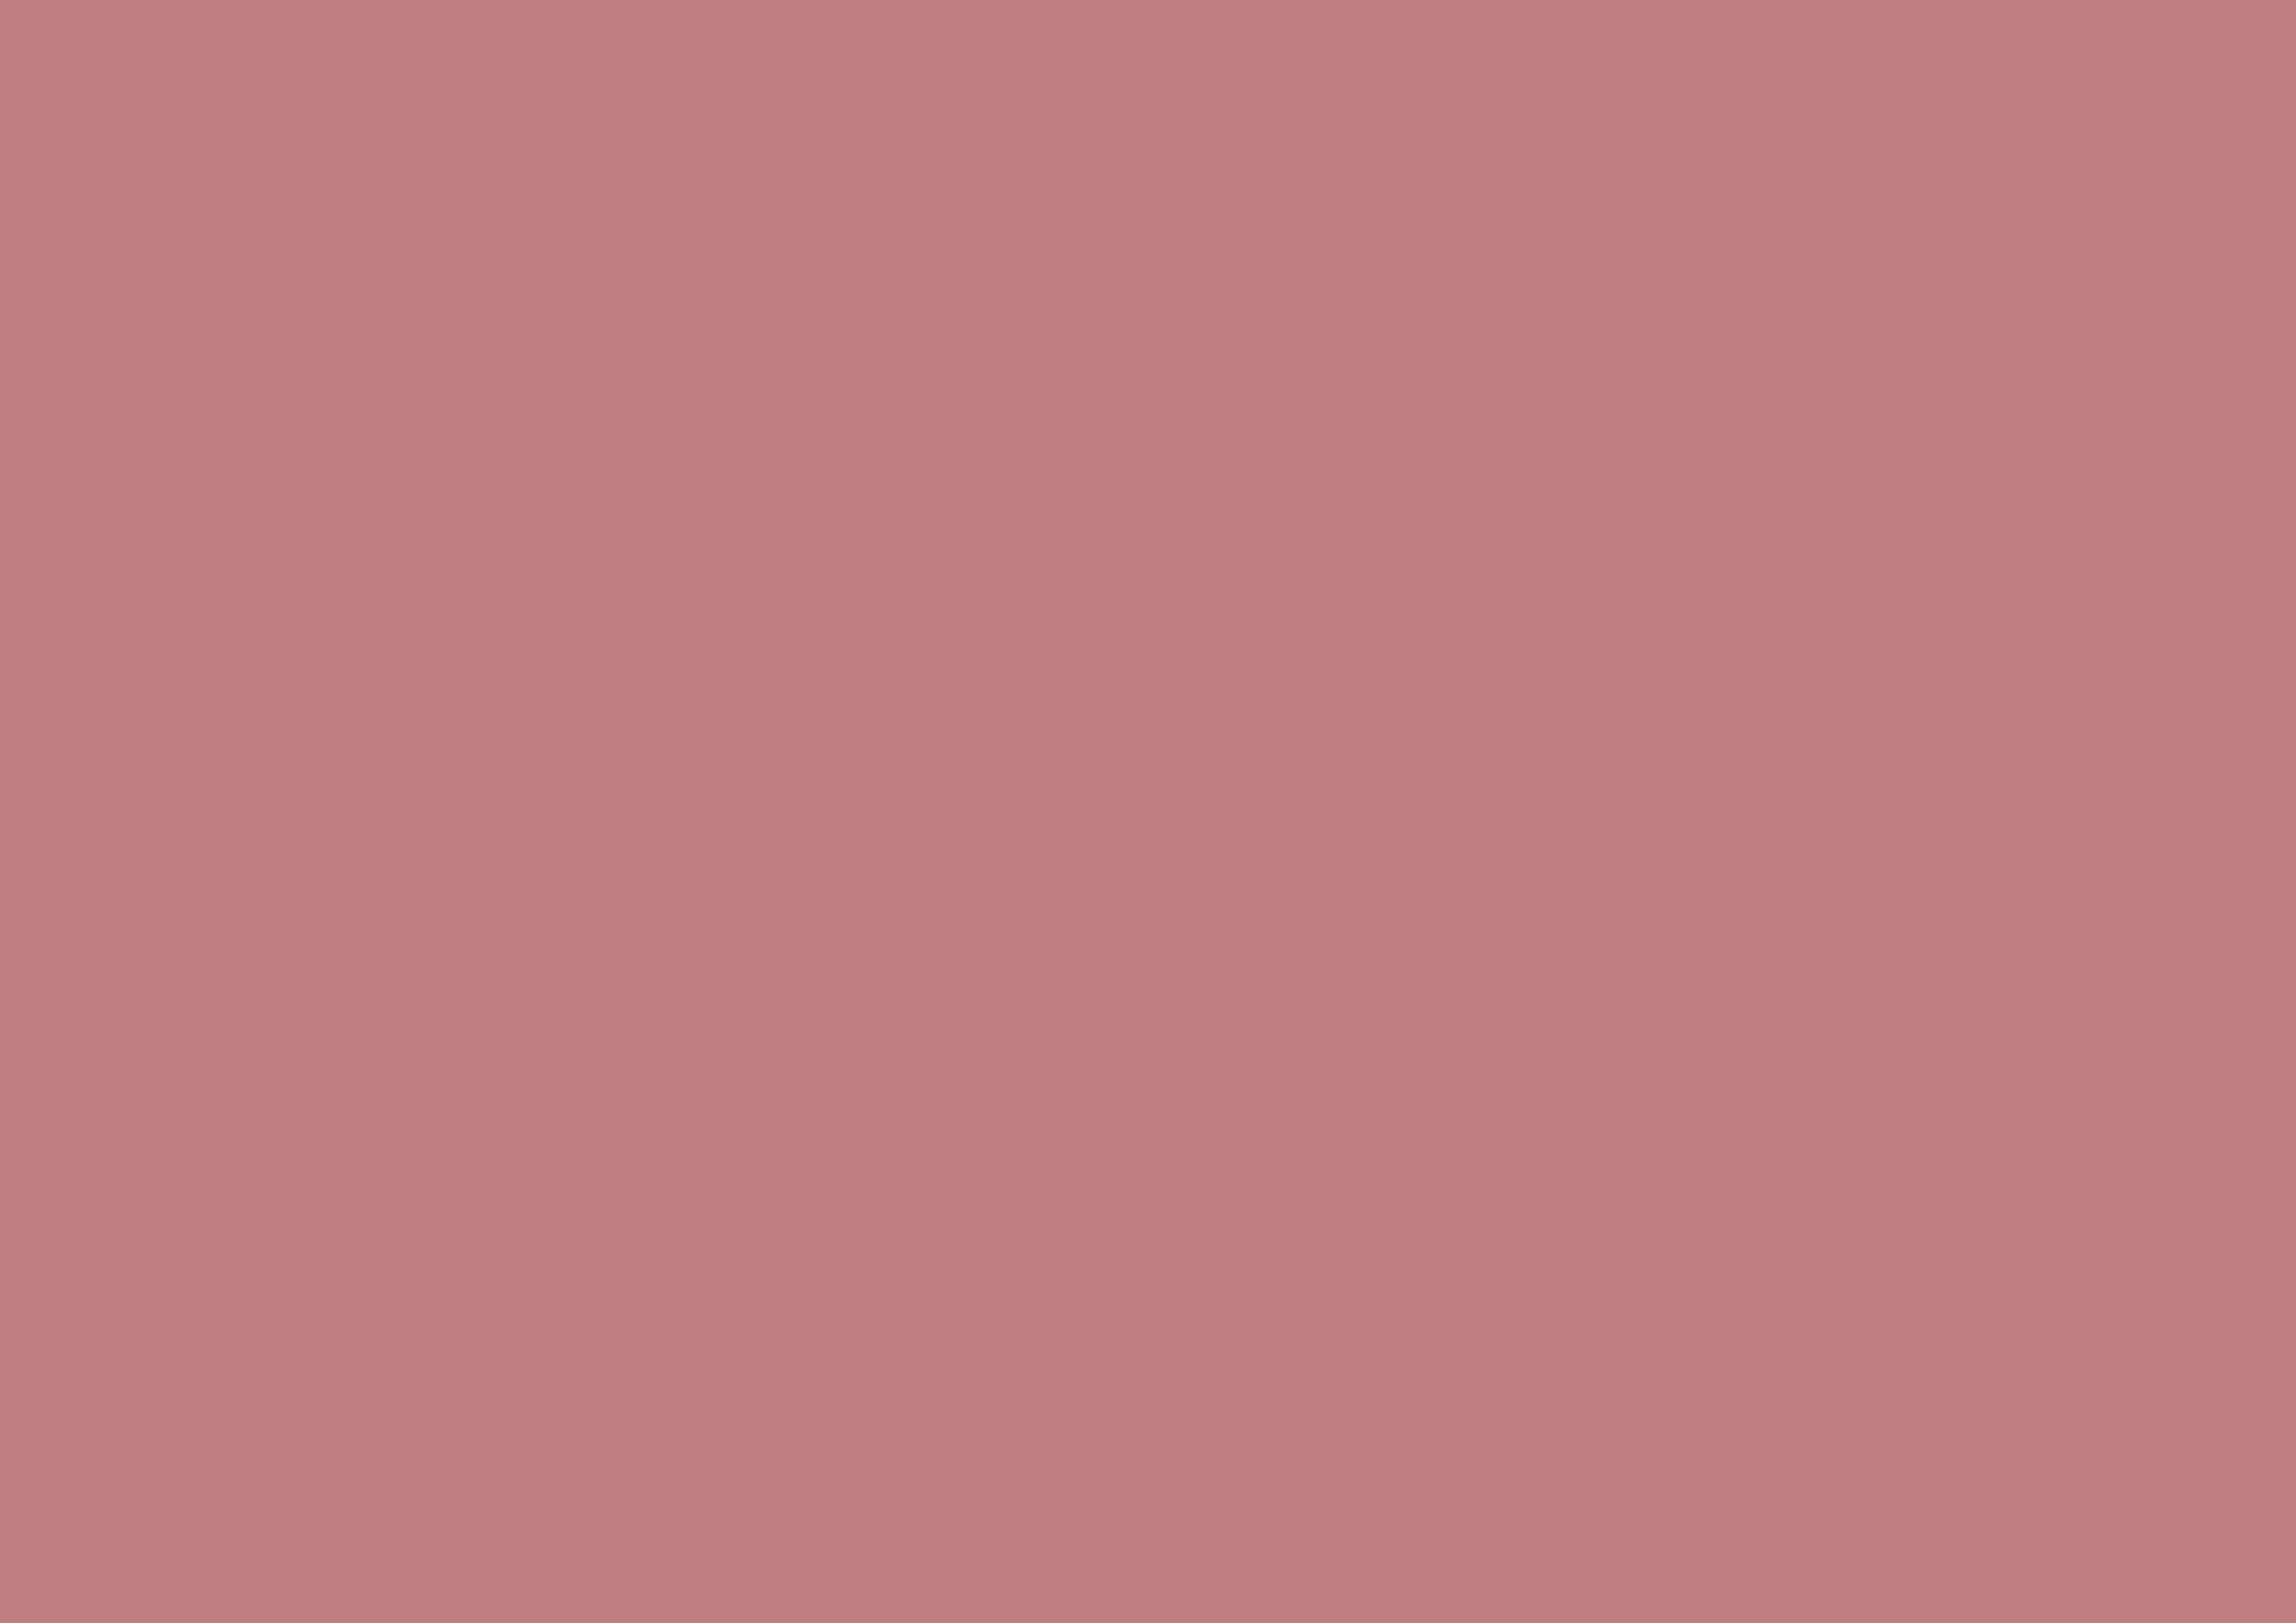 3508x2480 Old Rose Solid Color Background